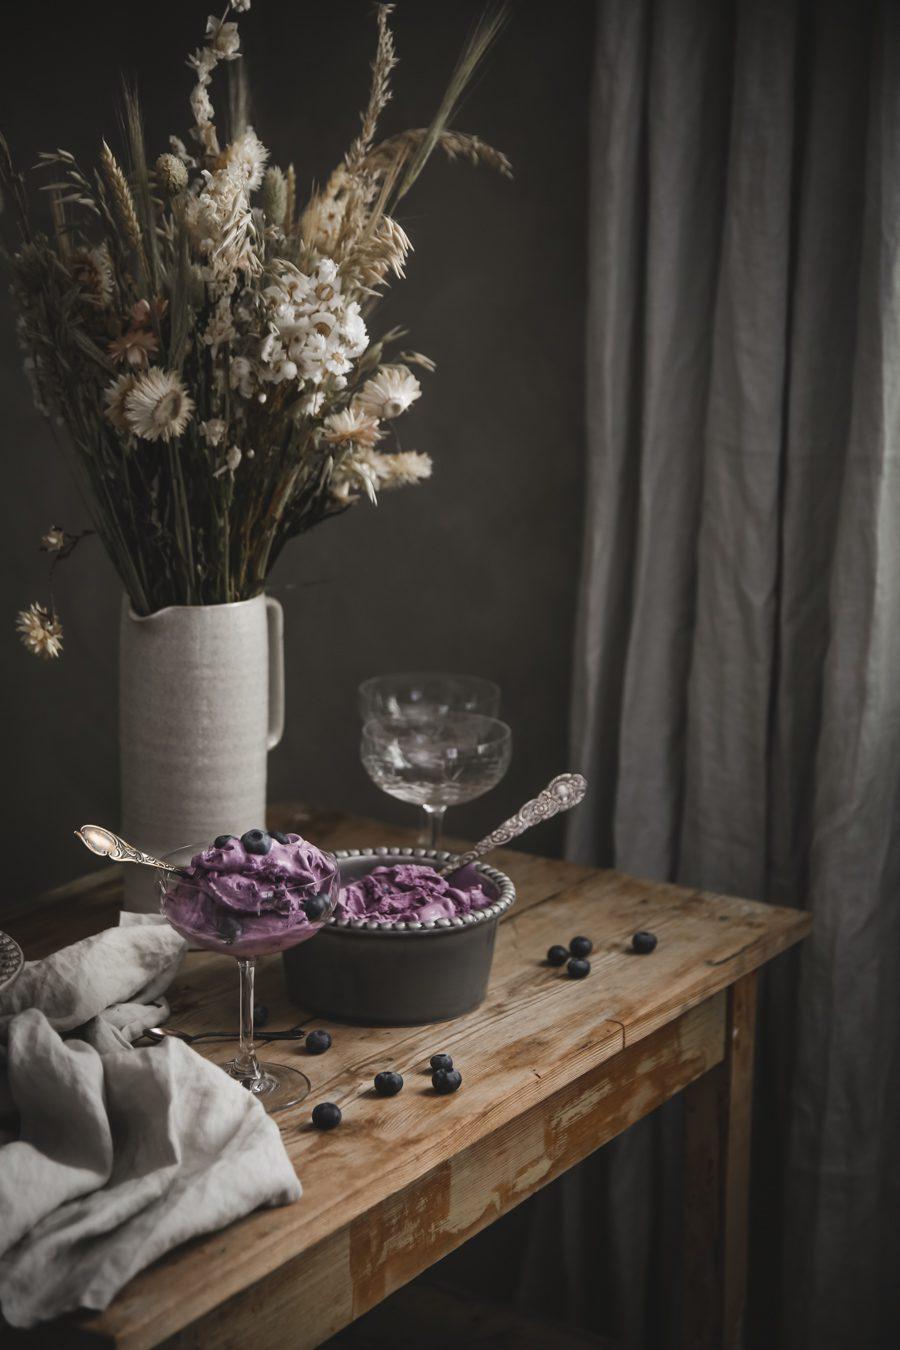 viktoria.holmgren.lovely.life.blabarsglass.recept